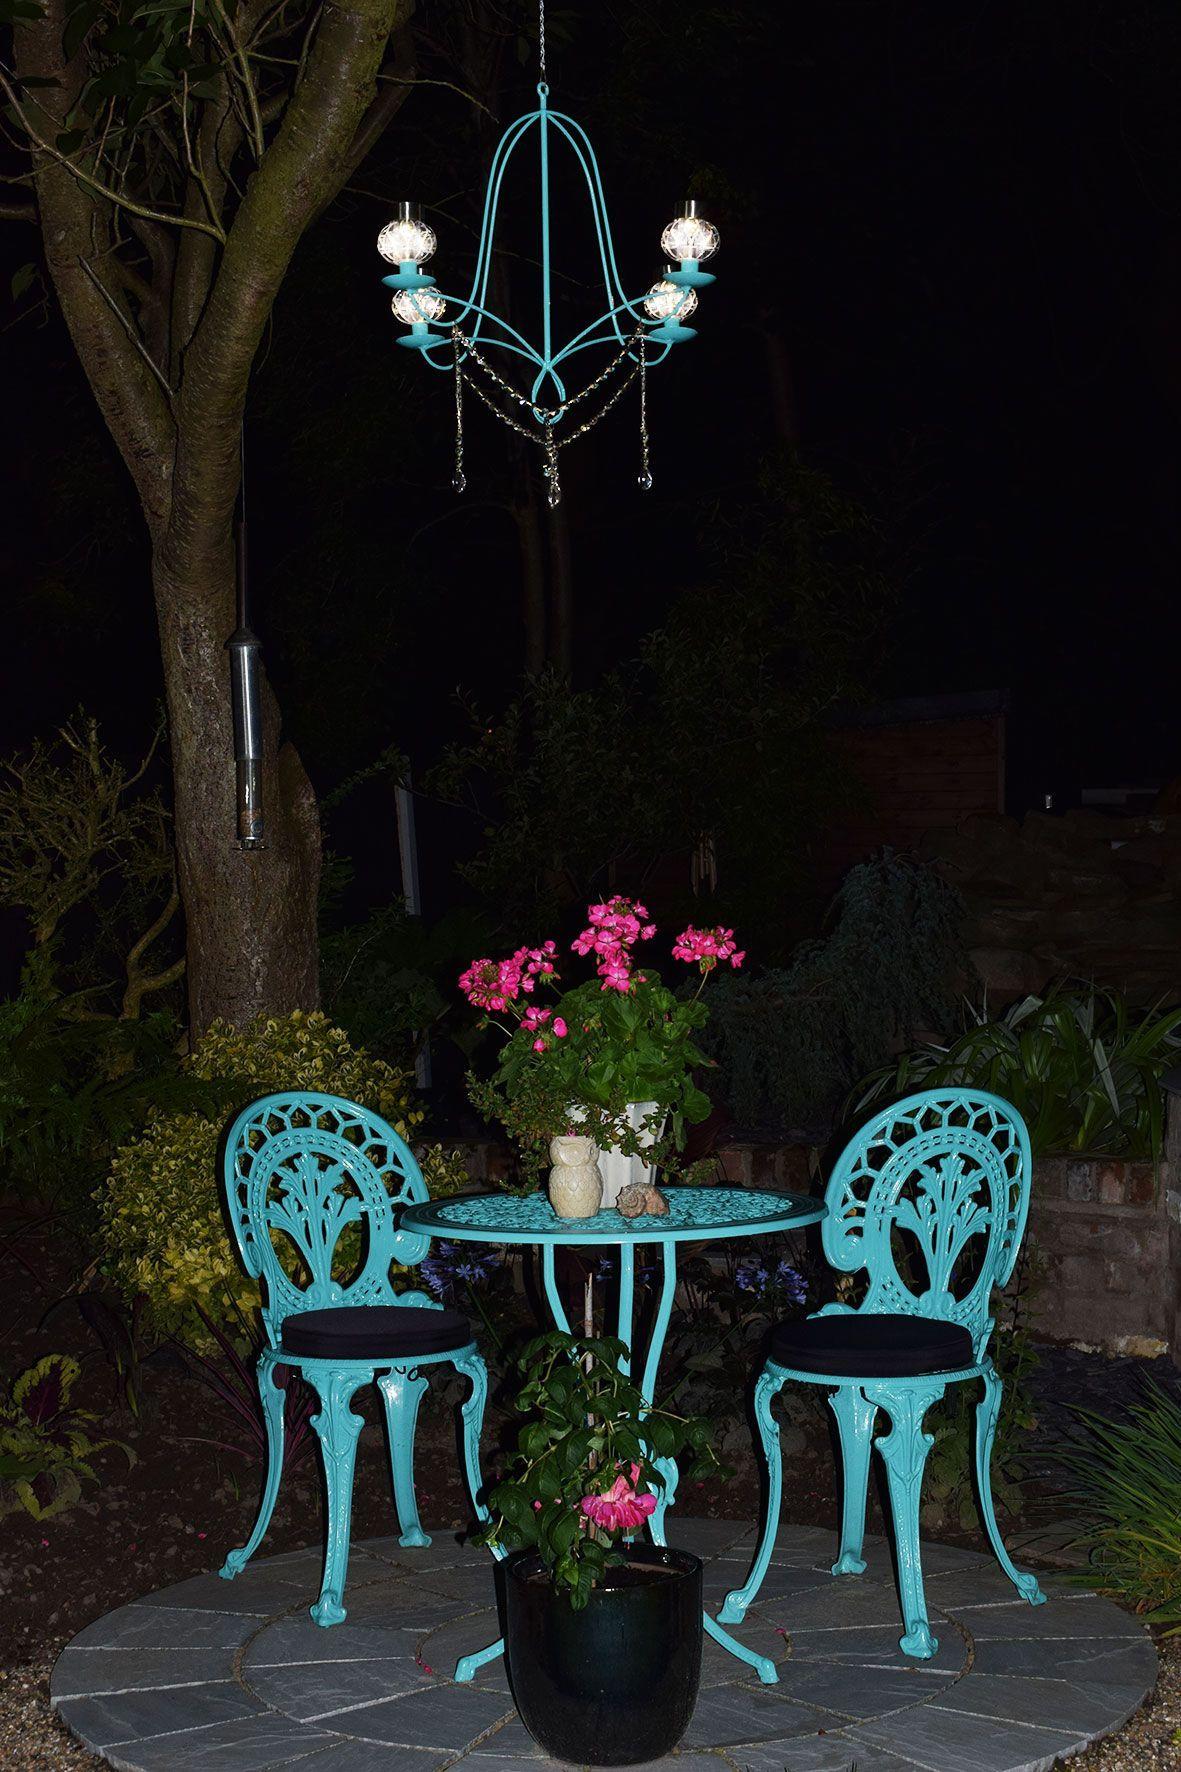 Diy Solar Chandelier To Glam Up Your Garden Solar Chandelier Diy Solar Chandelier Backyard Design